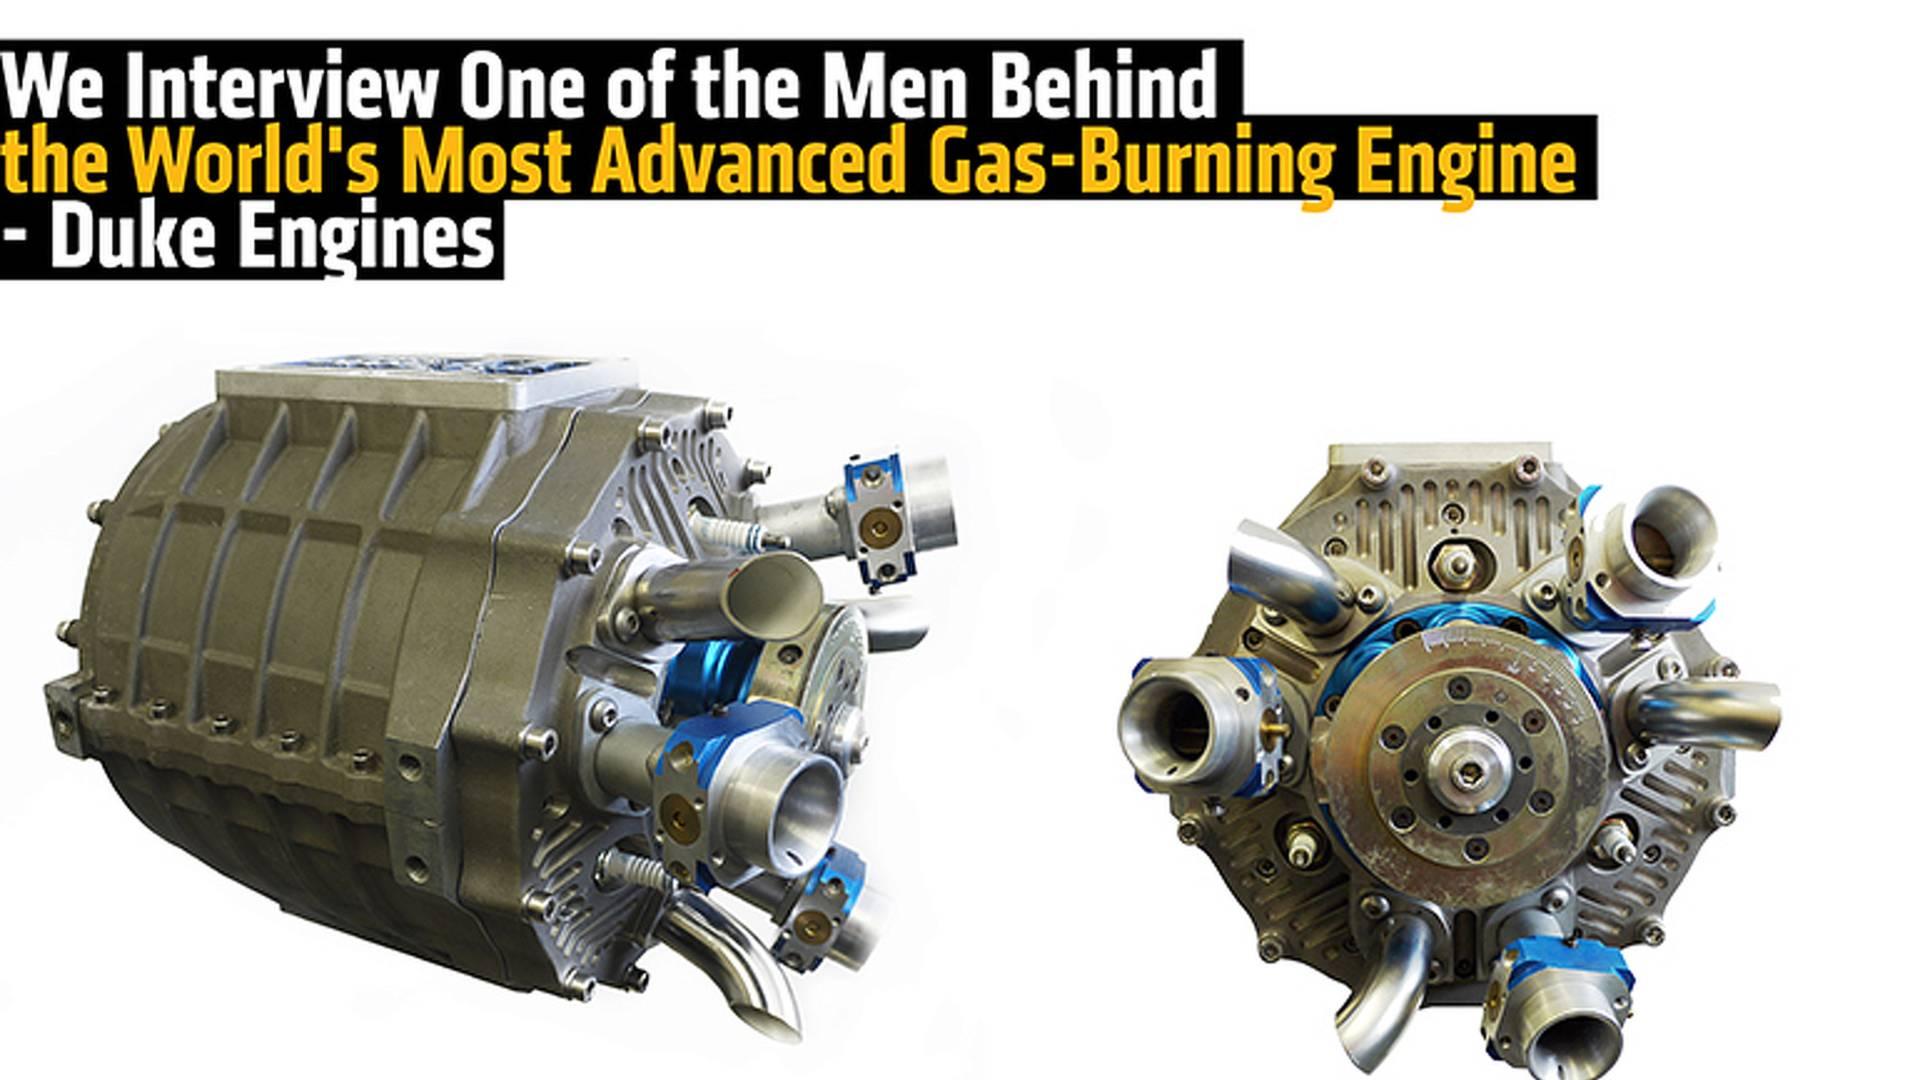 Iron Duke Engine Diagram